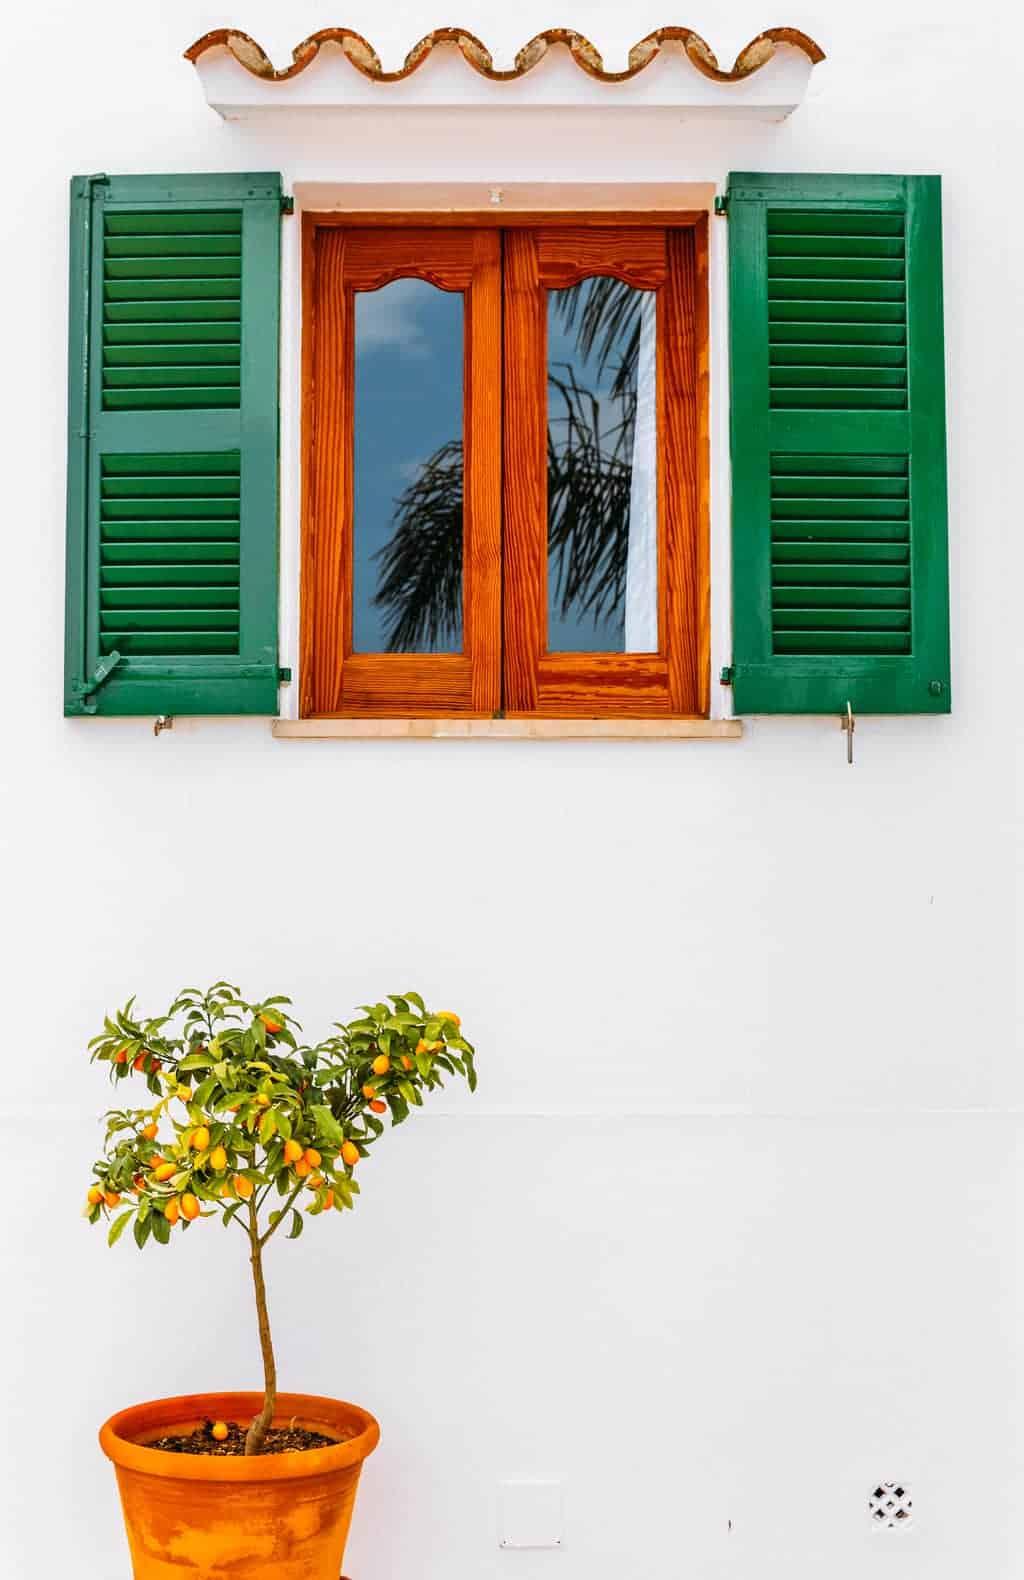 Windows of Majorca, Spain